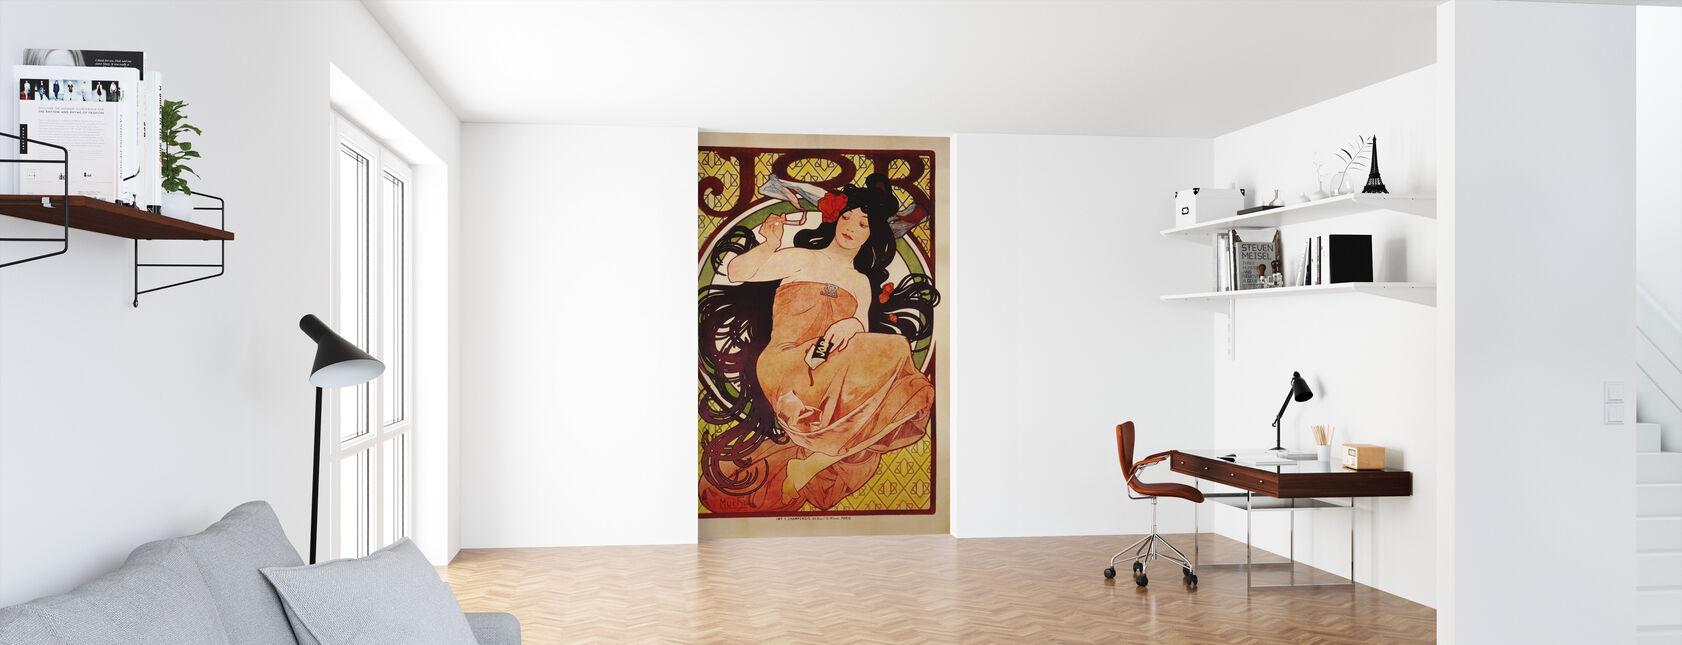 Alphonse Mucha - Job Colour Litho - Tapete - Büro